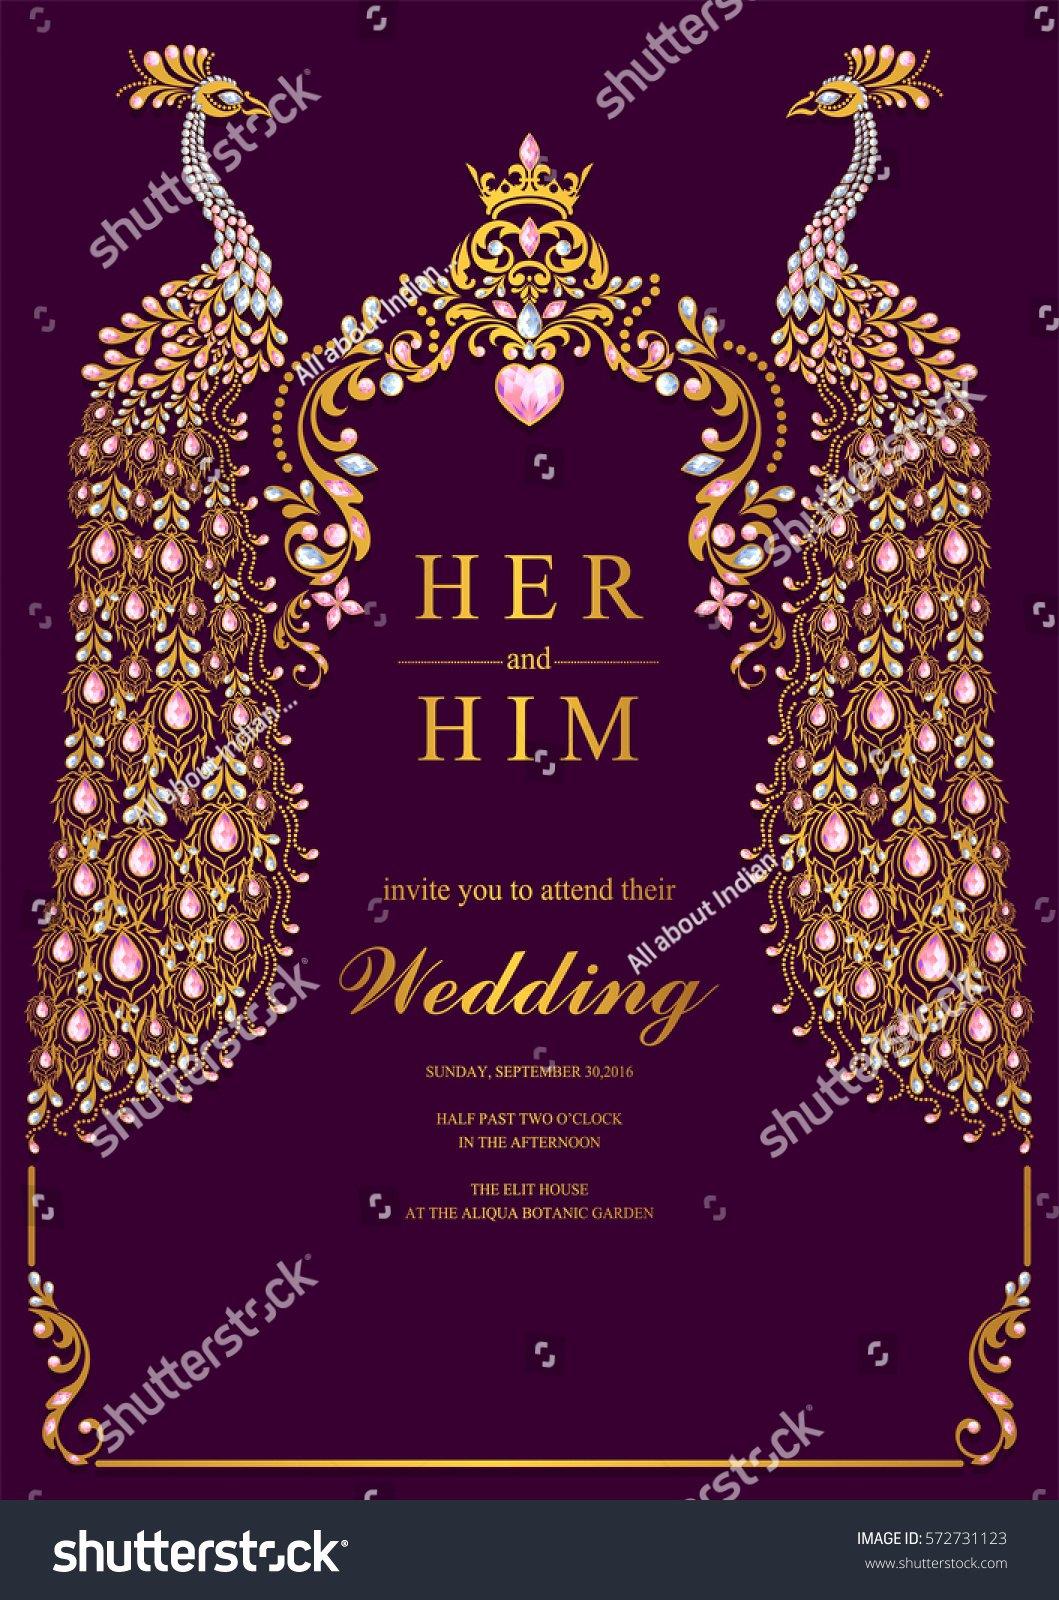 Hindu Wedding Invitation Template Awesome Indian Wedding Invitation Card Templates Gold Stock Vector